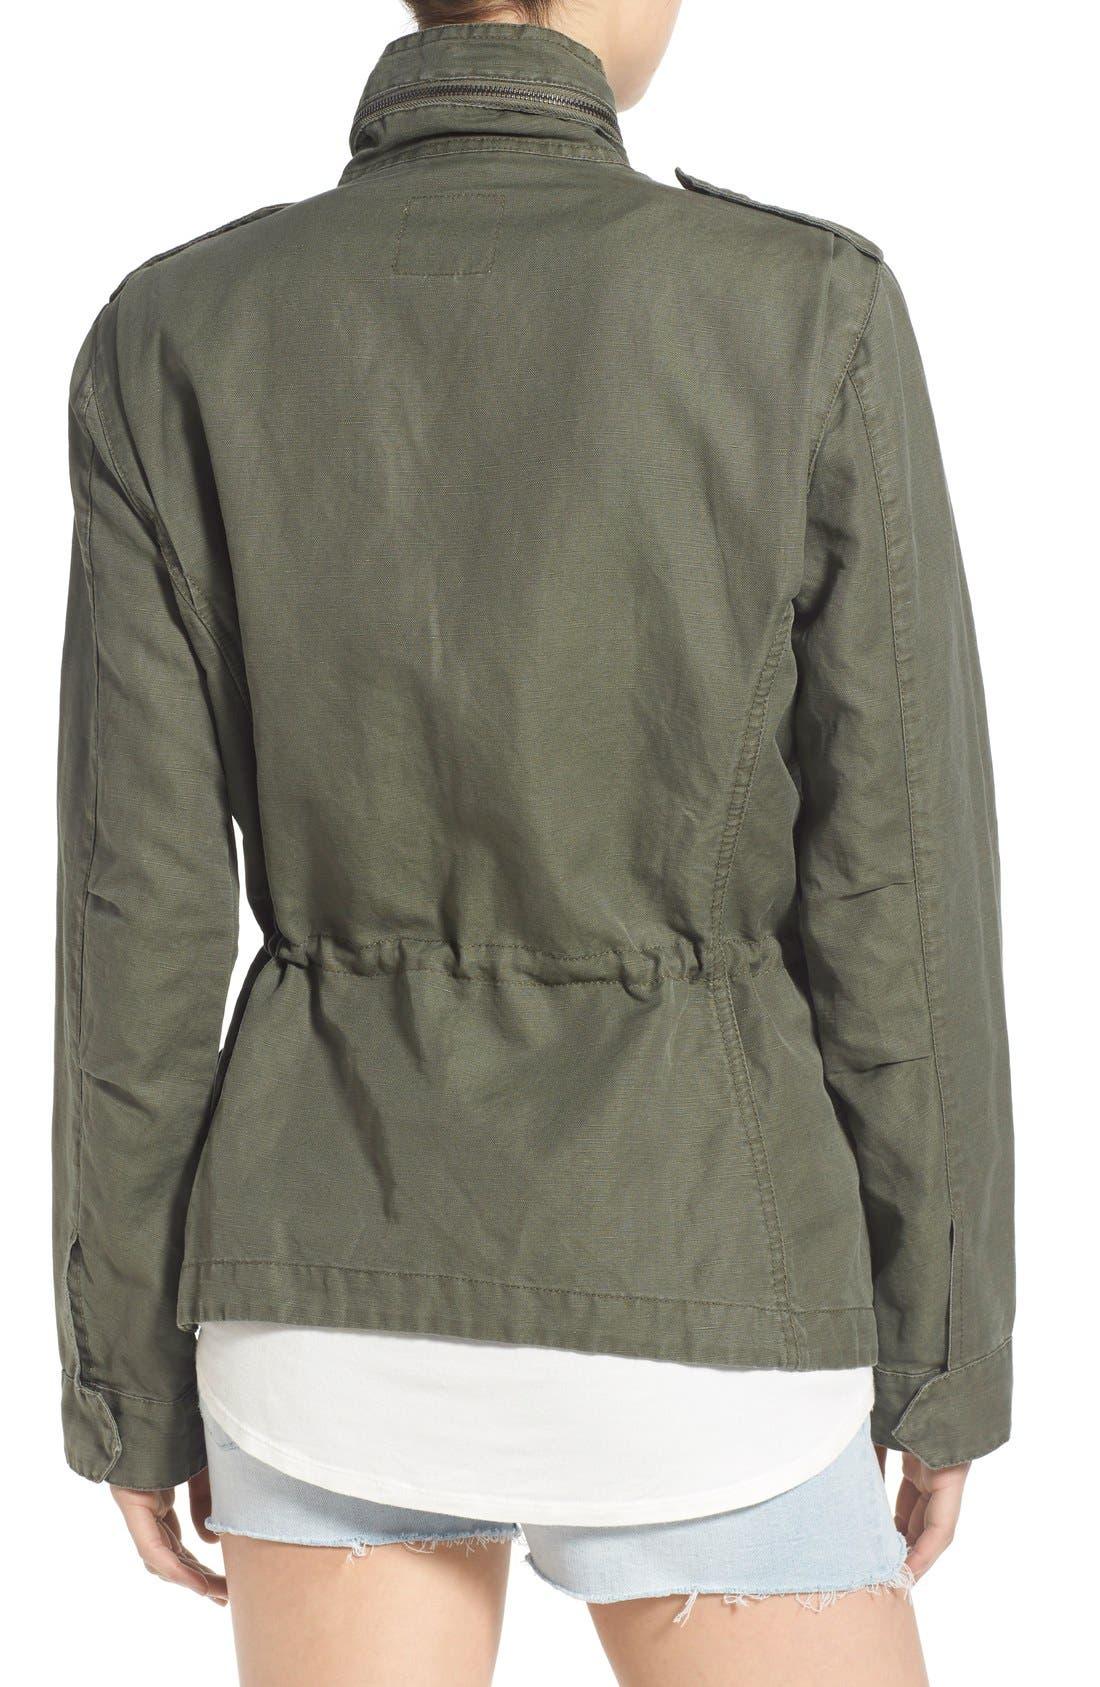 Alternate Image 2  - Thread & Supply 'Outsider' Field Jacket